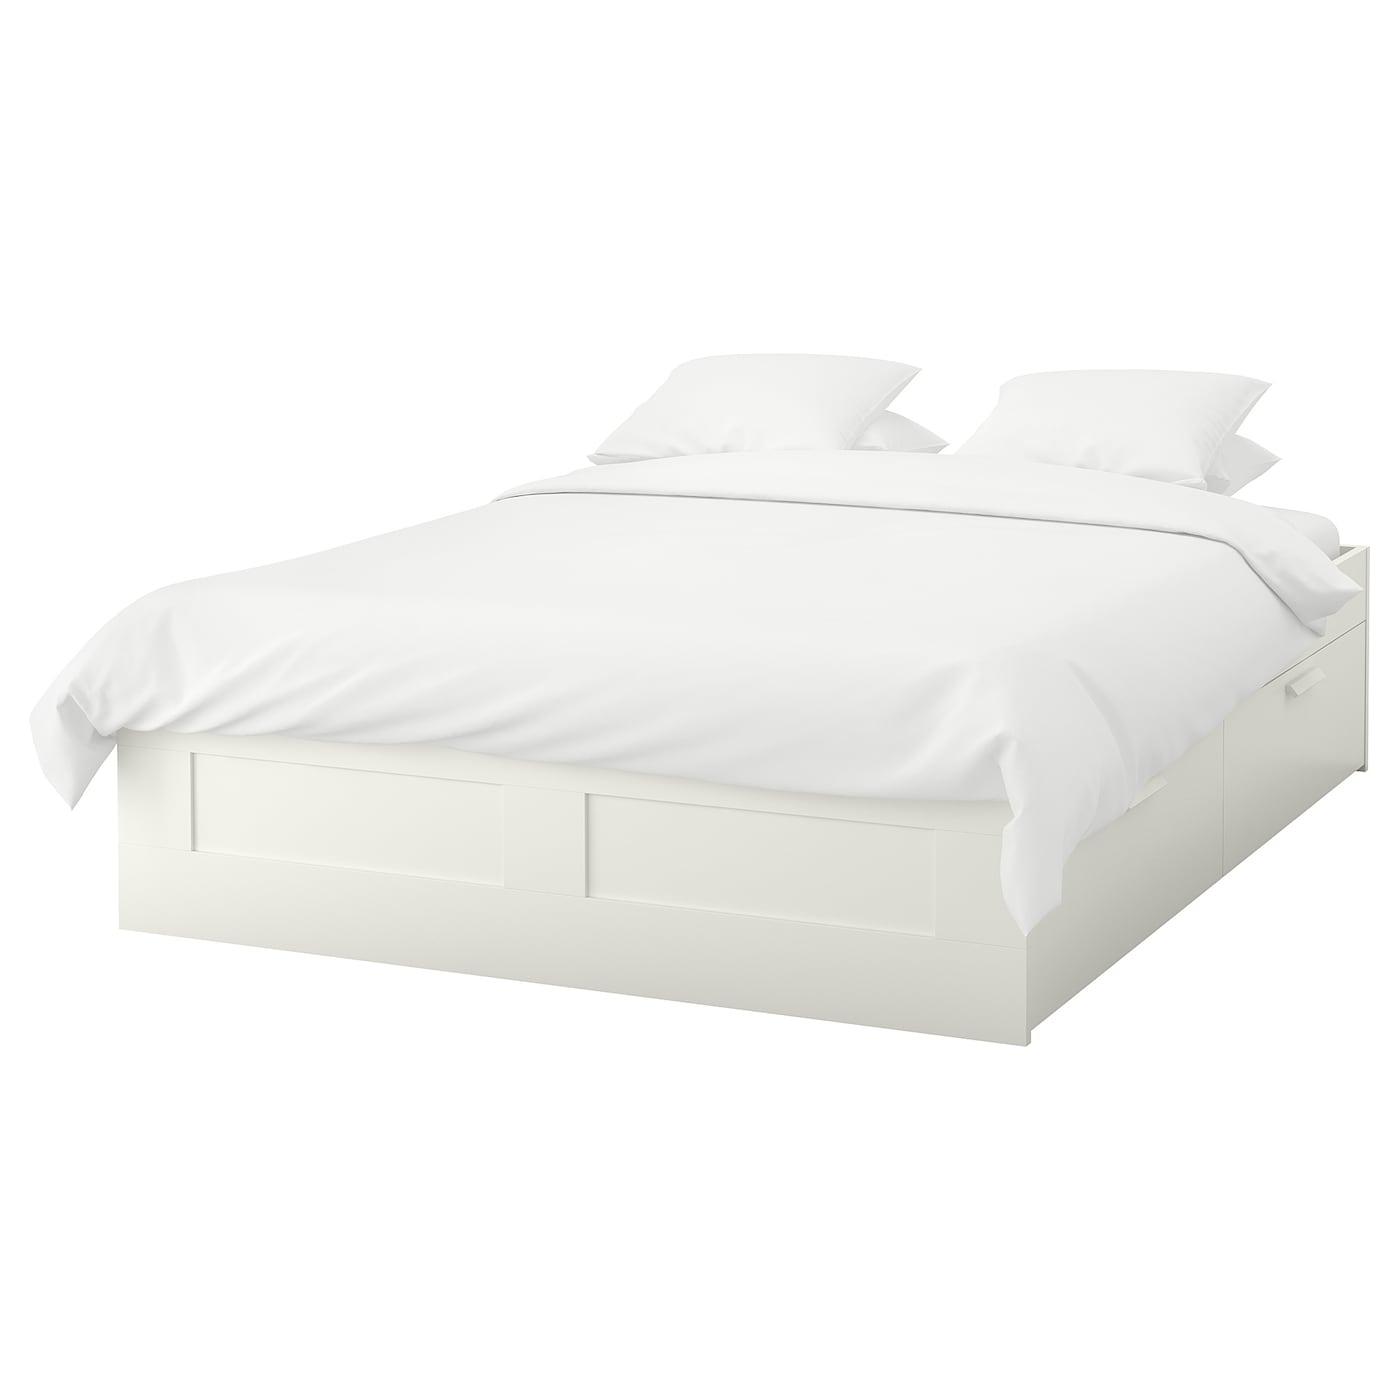 Brimnes Nachtkastje Top Ikea Brimnes Bed Frame W Storage And